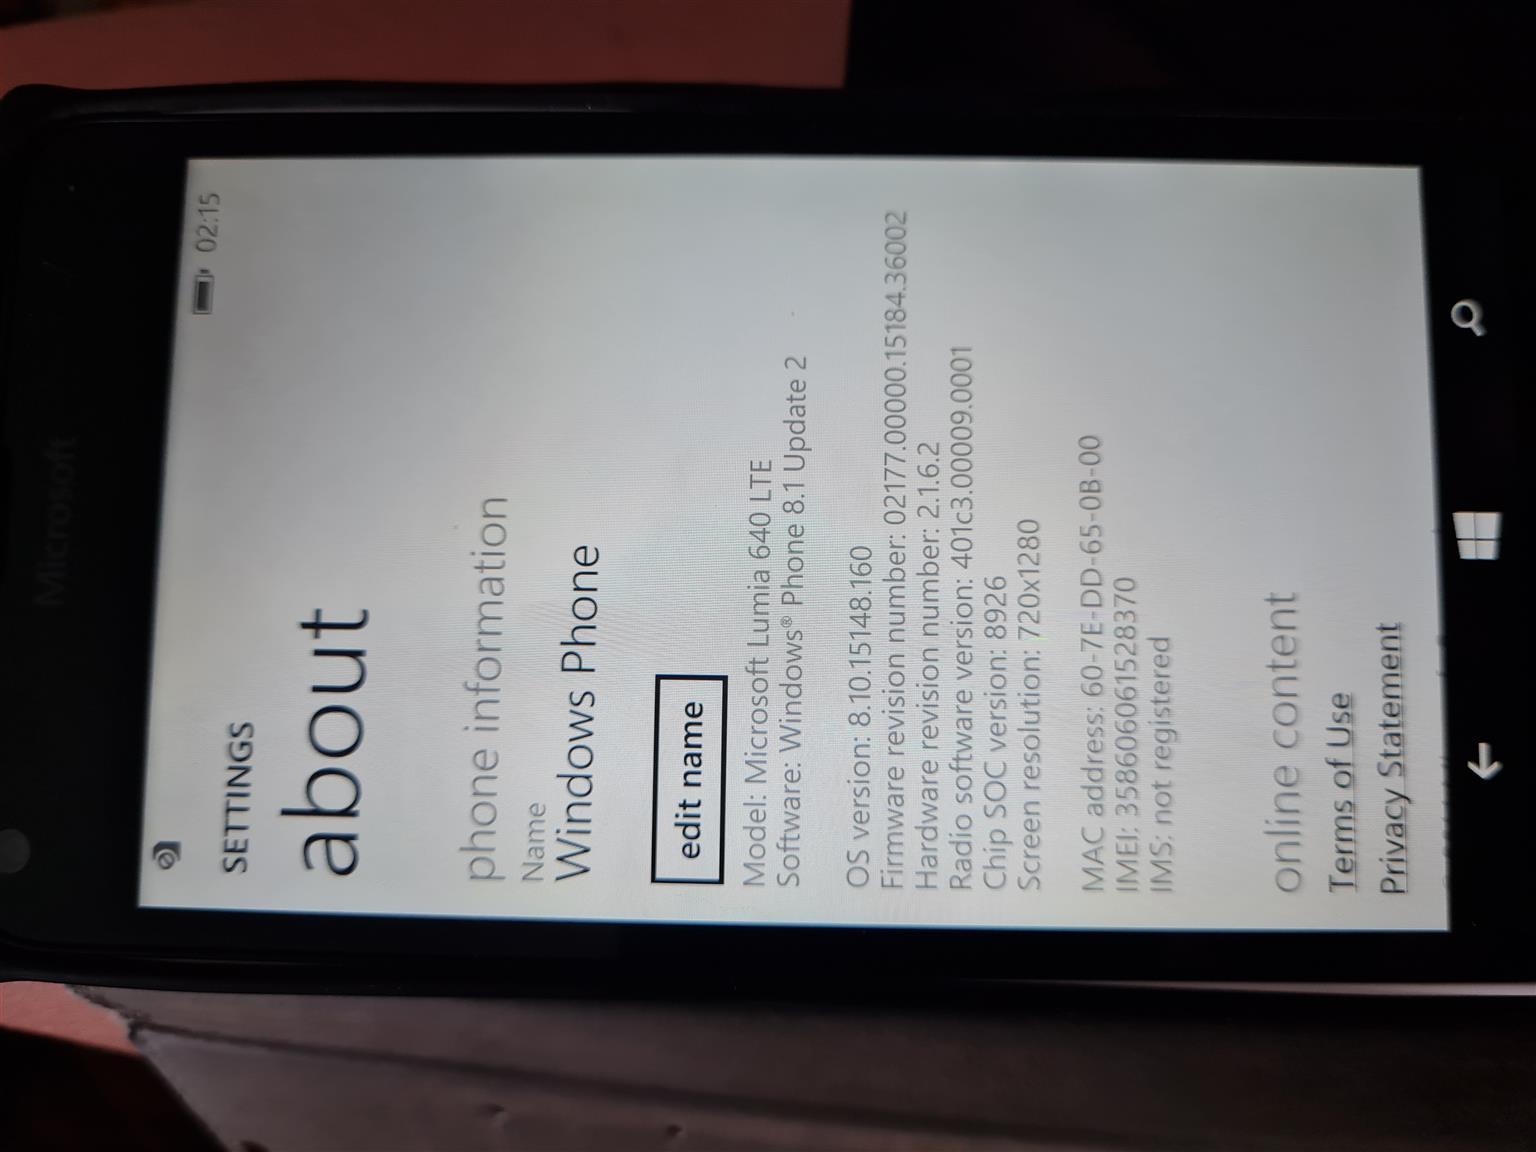 Microsoft Lumia RM-1074 Cellphone